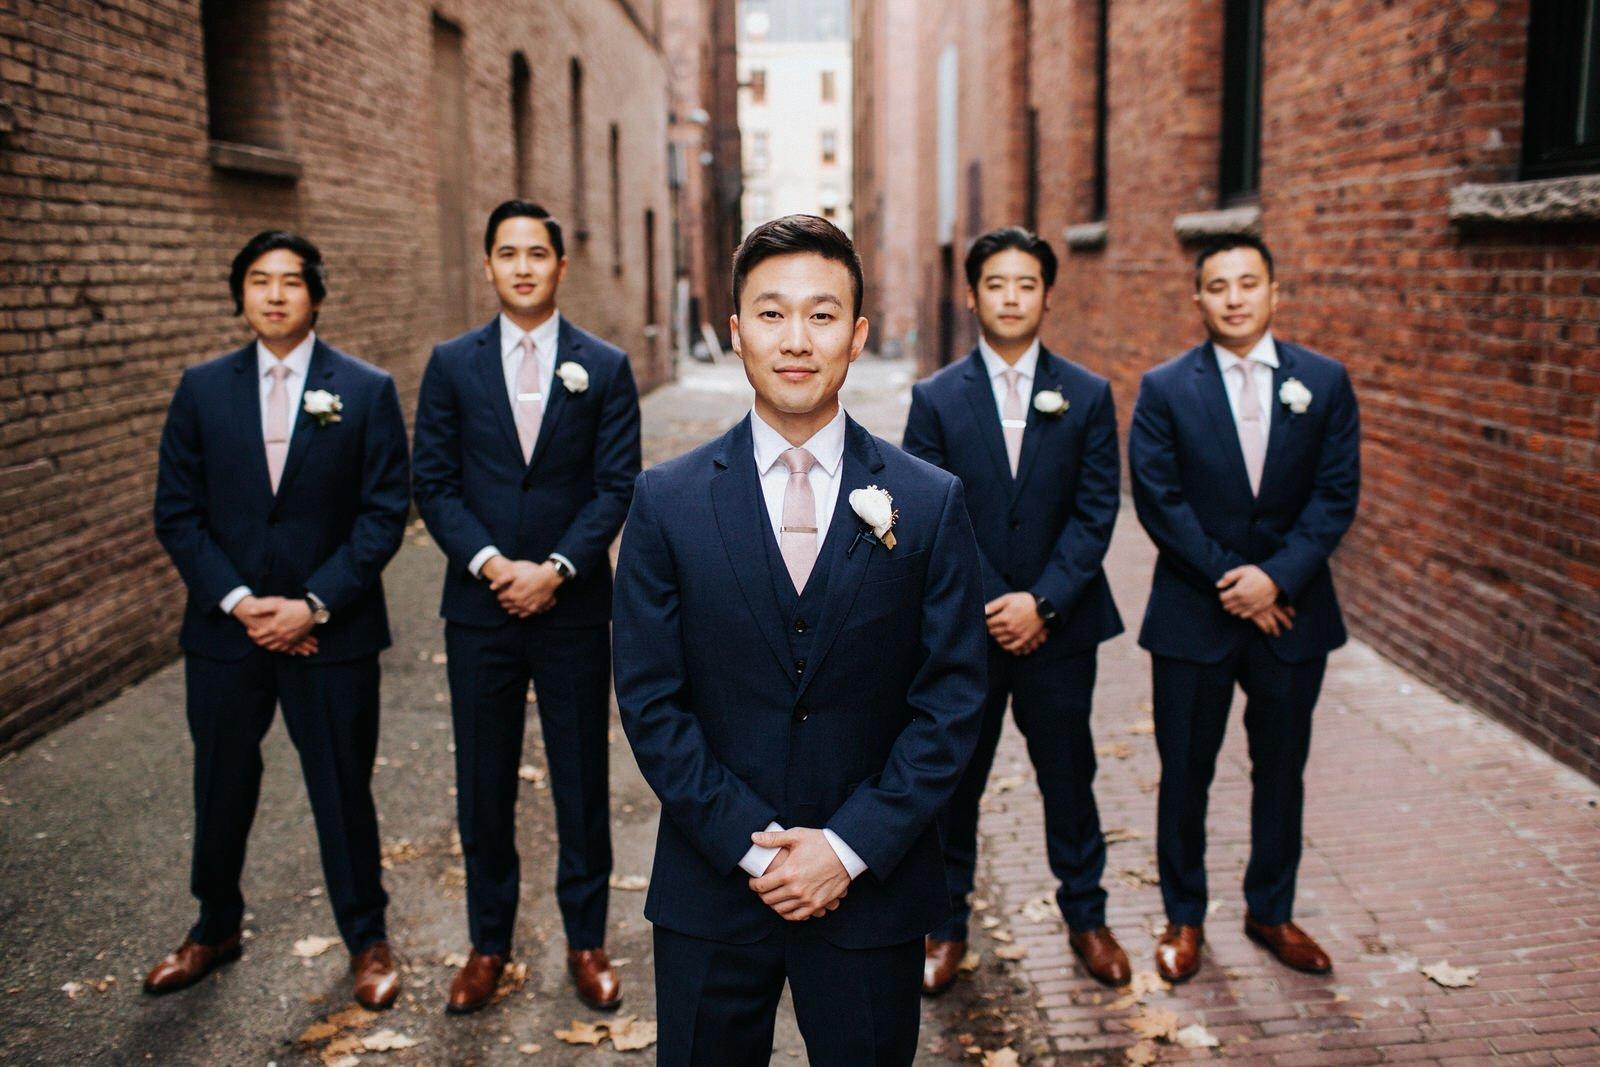 The groomsmen pose in pioneer square before their wedding